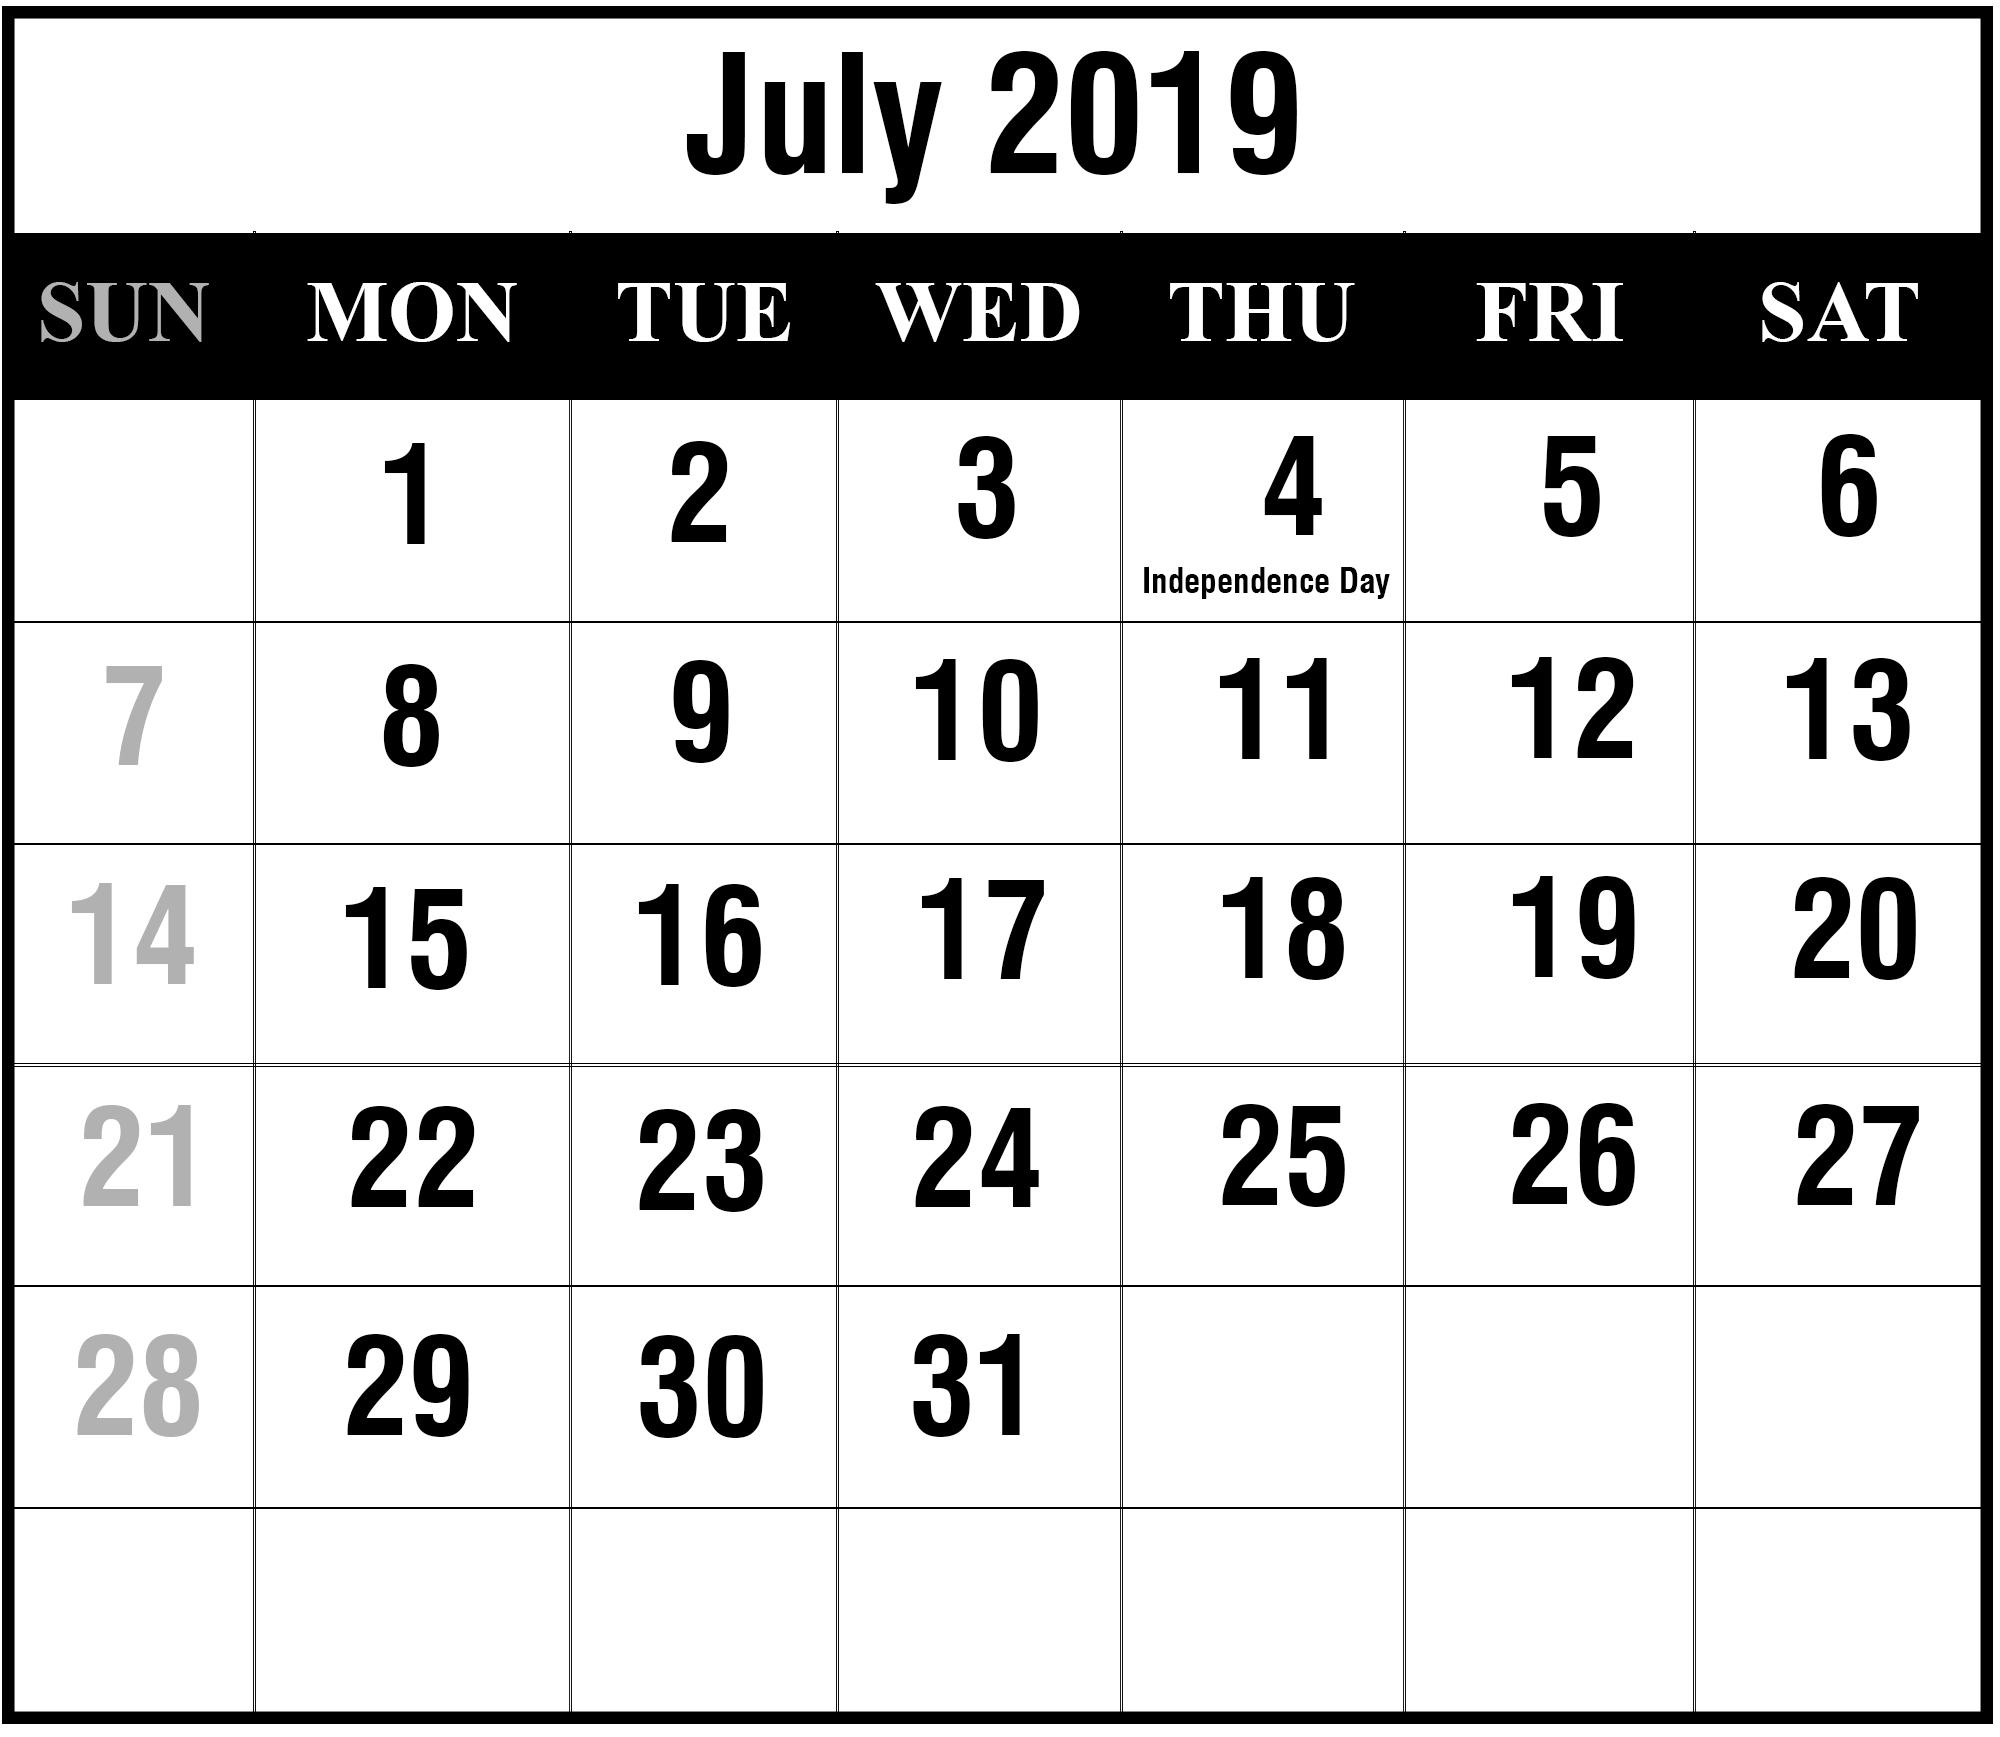 July 2019 Calendar Printable   July Blank Calendar Template July 1 2019 Calendar